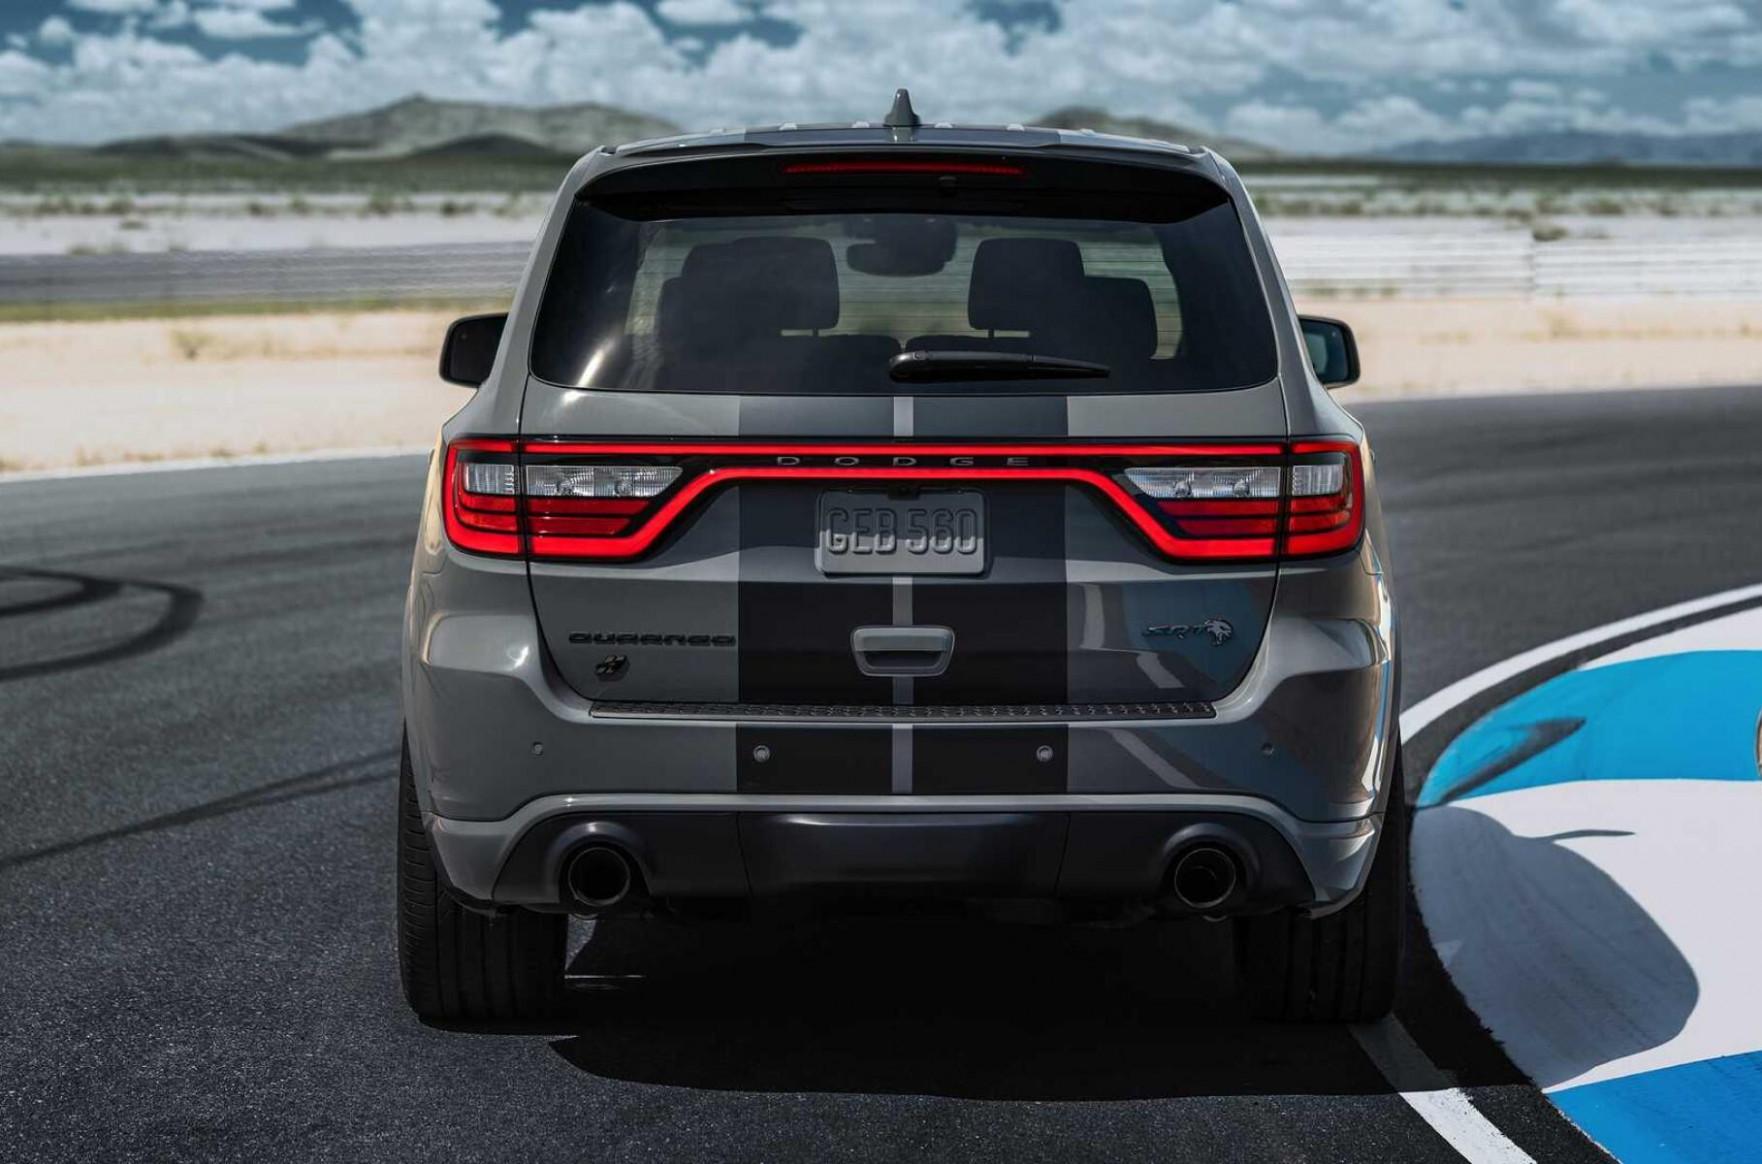 Specs Dodge Durango 2022